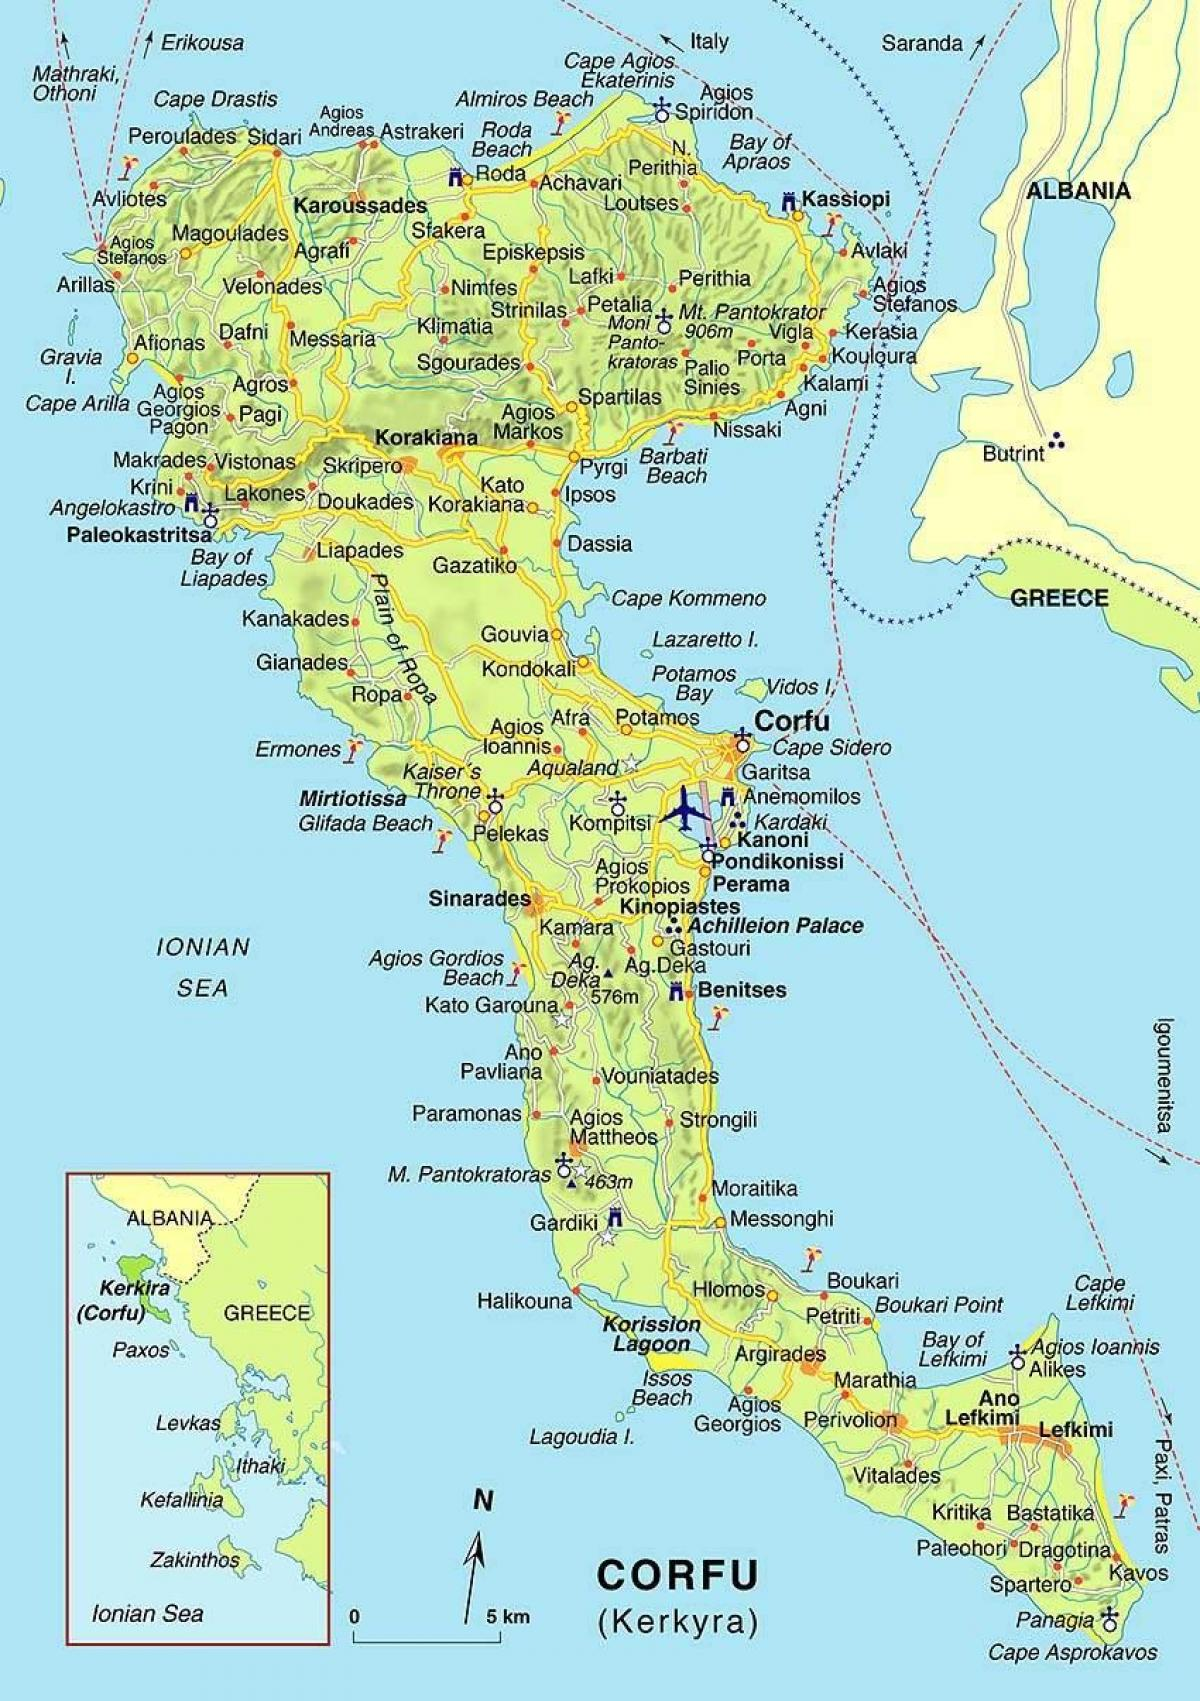 Corfu Greece map Map of Corfu Greece Southern Europe Europe